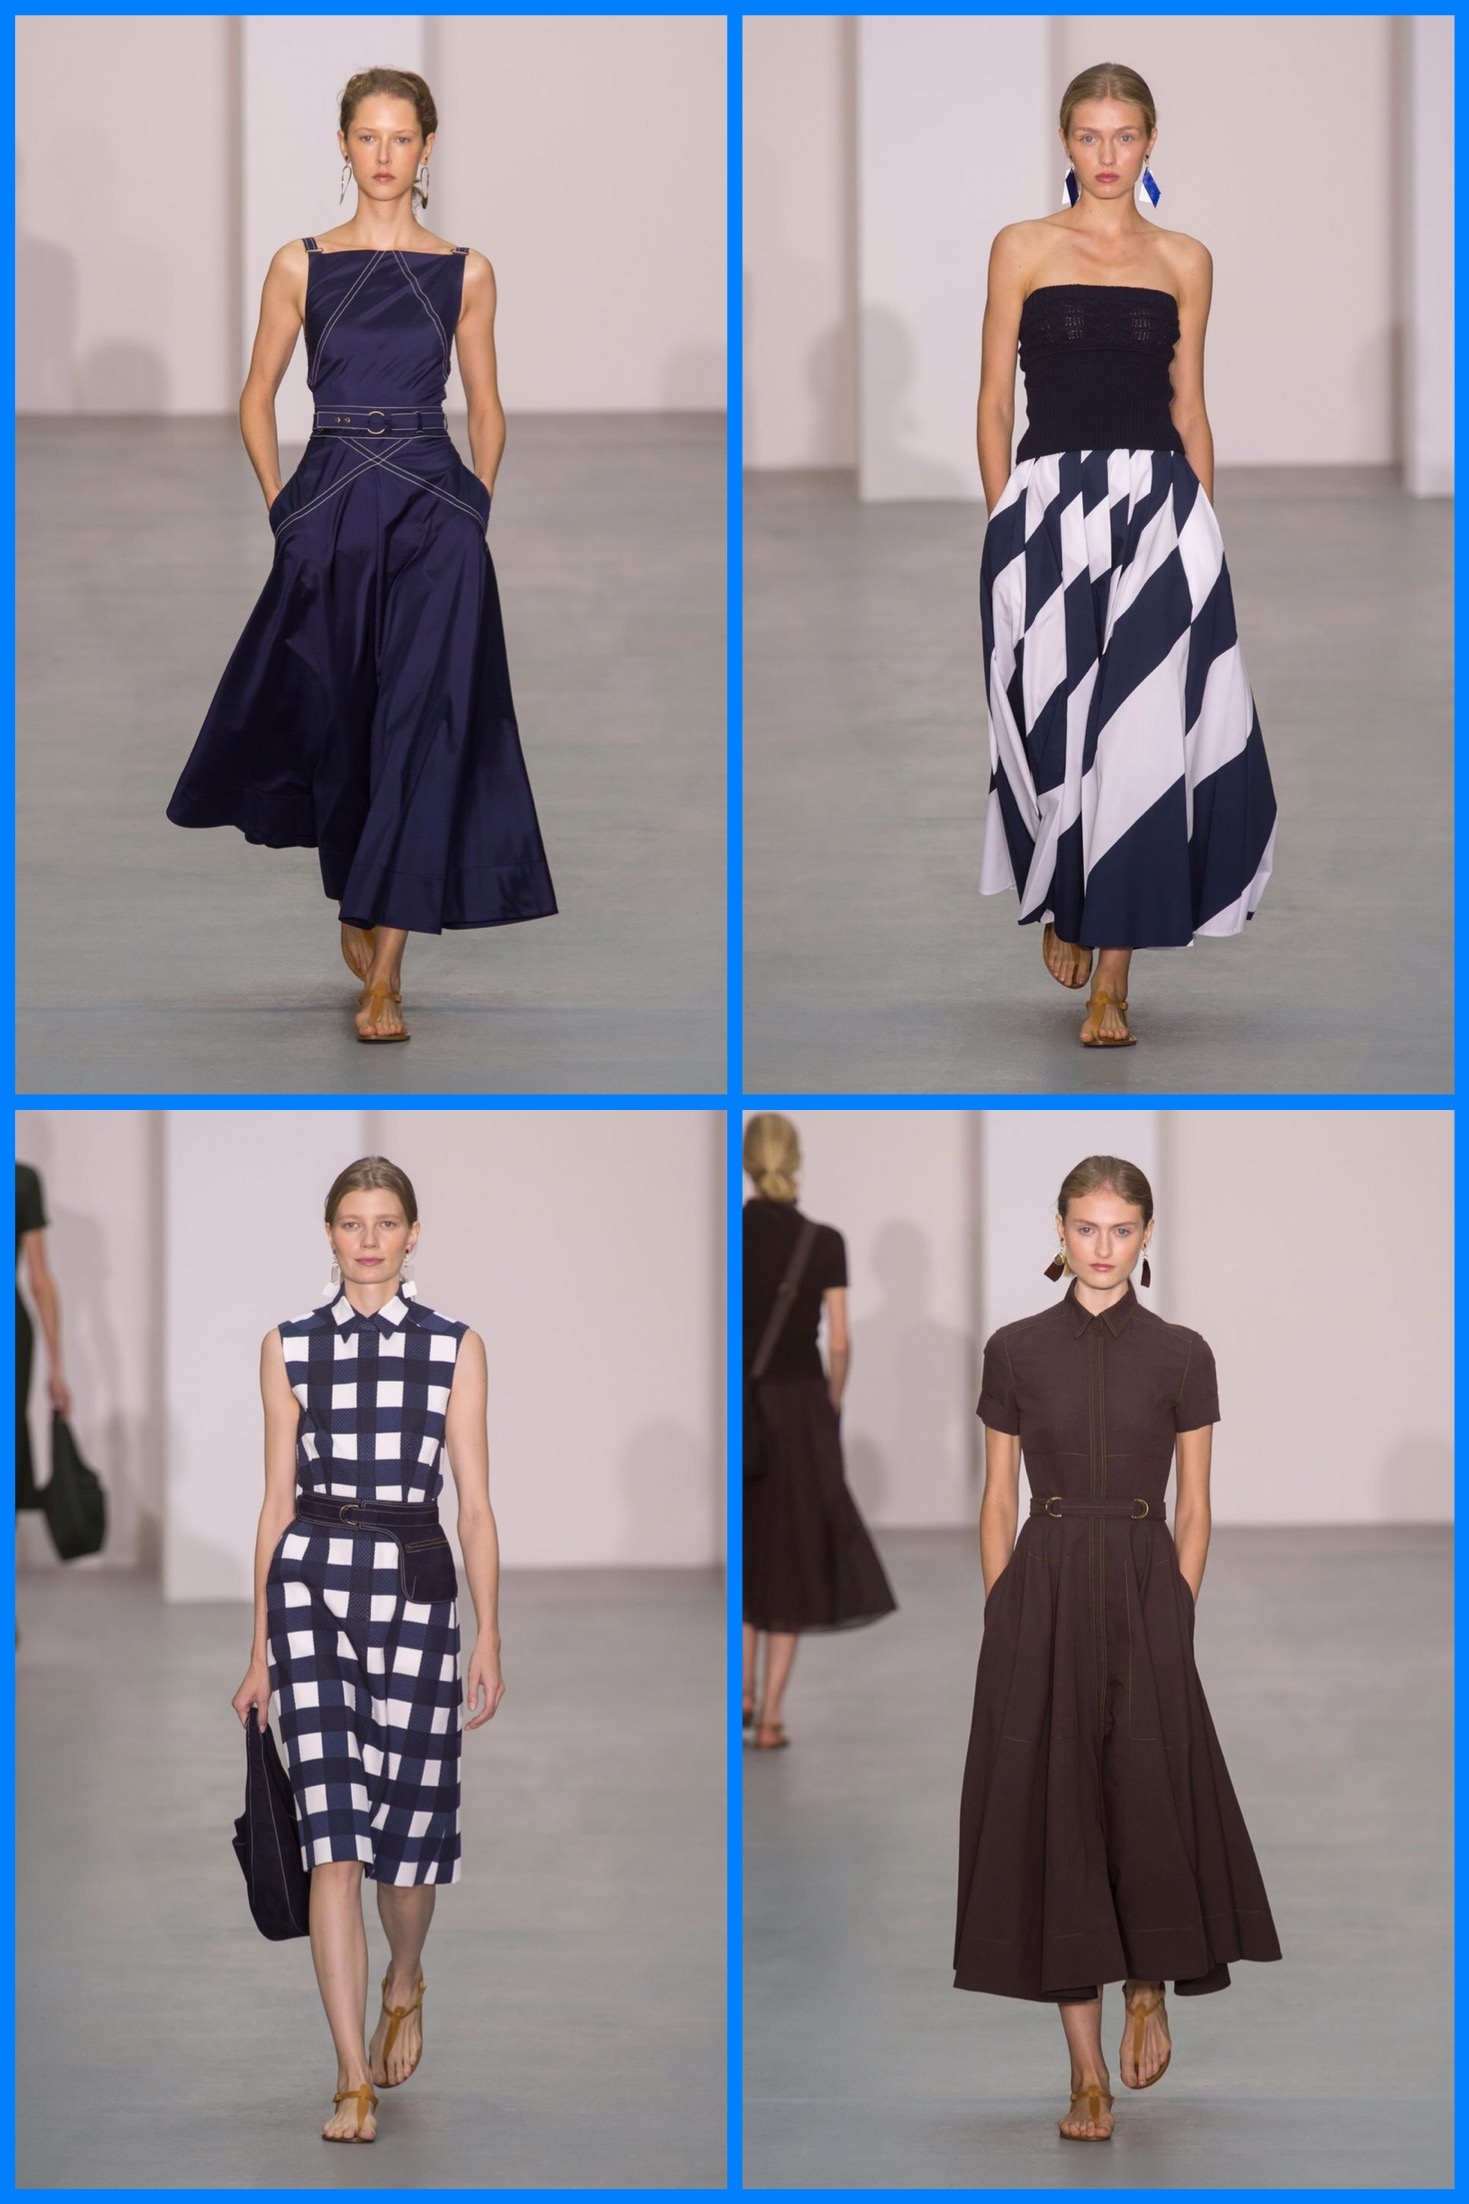 london-fashion-week-pret-a-porter-spring-summer-2017-style-jasper-conran